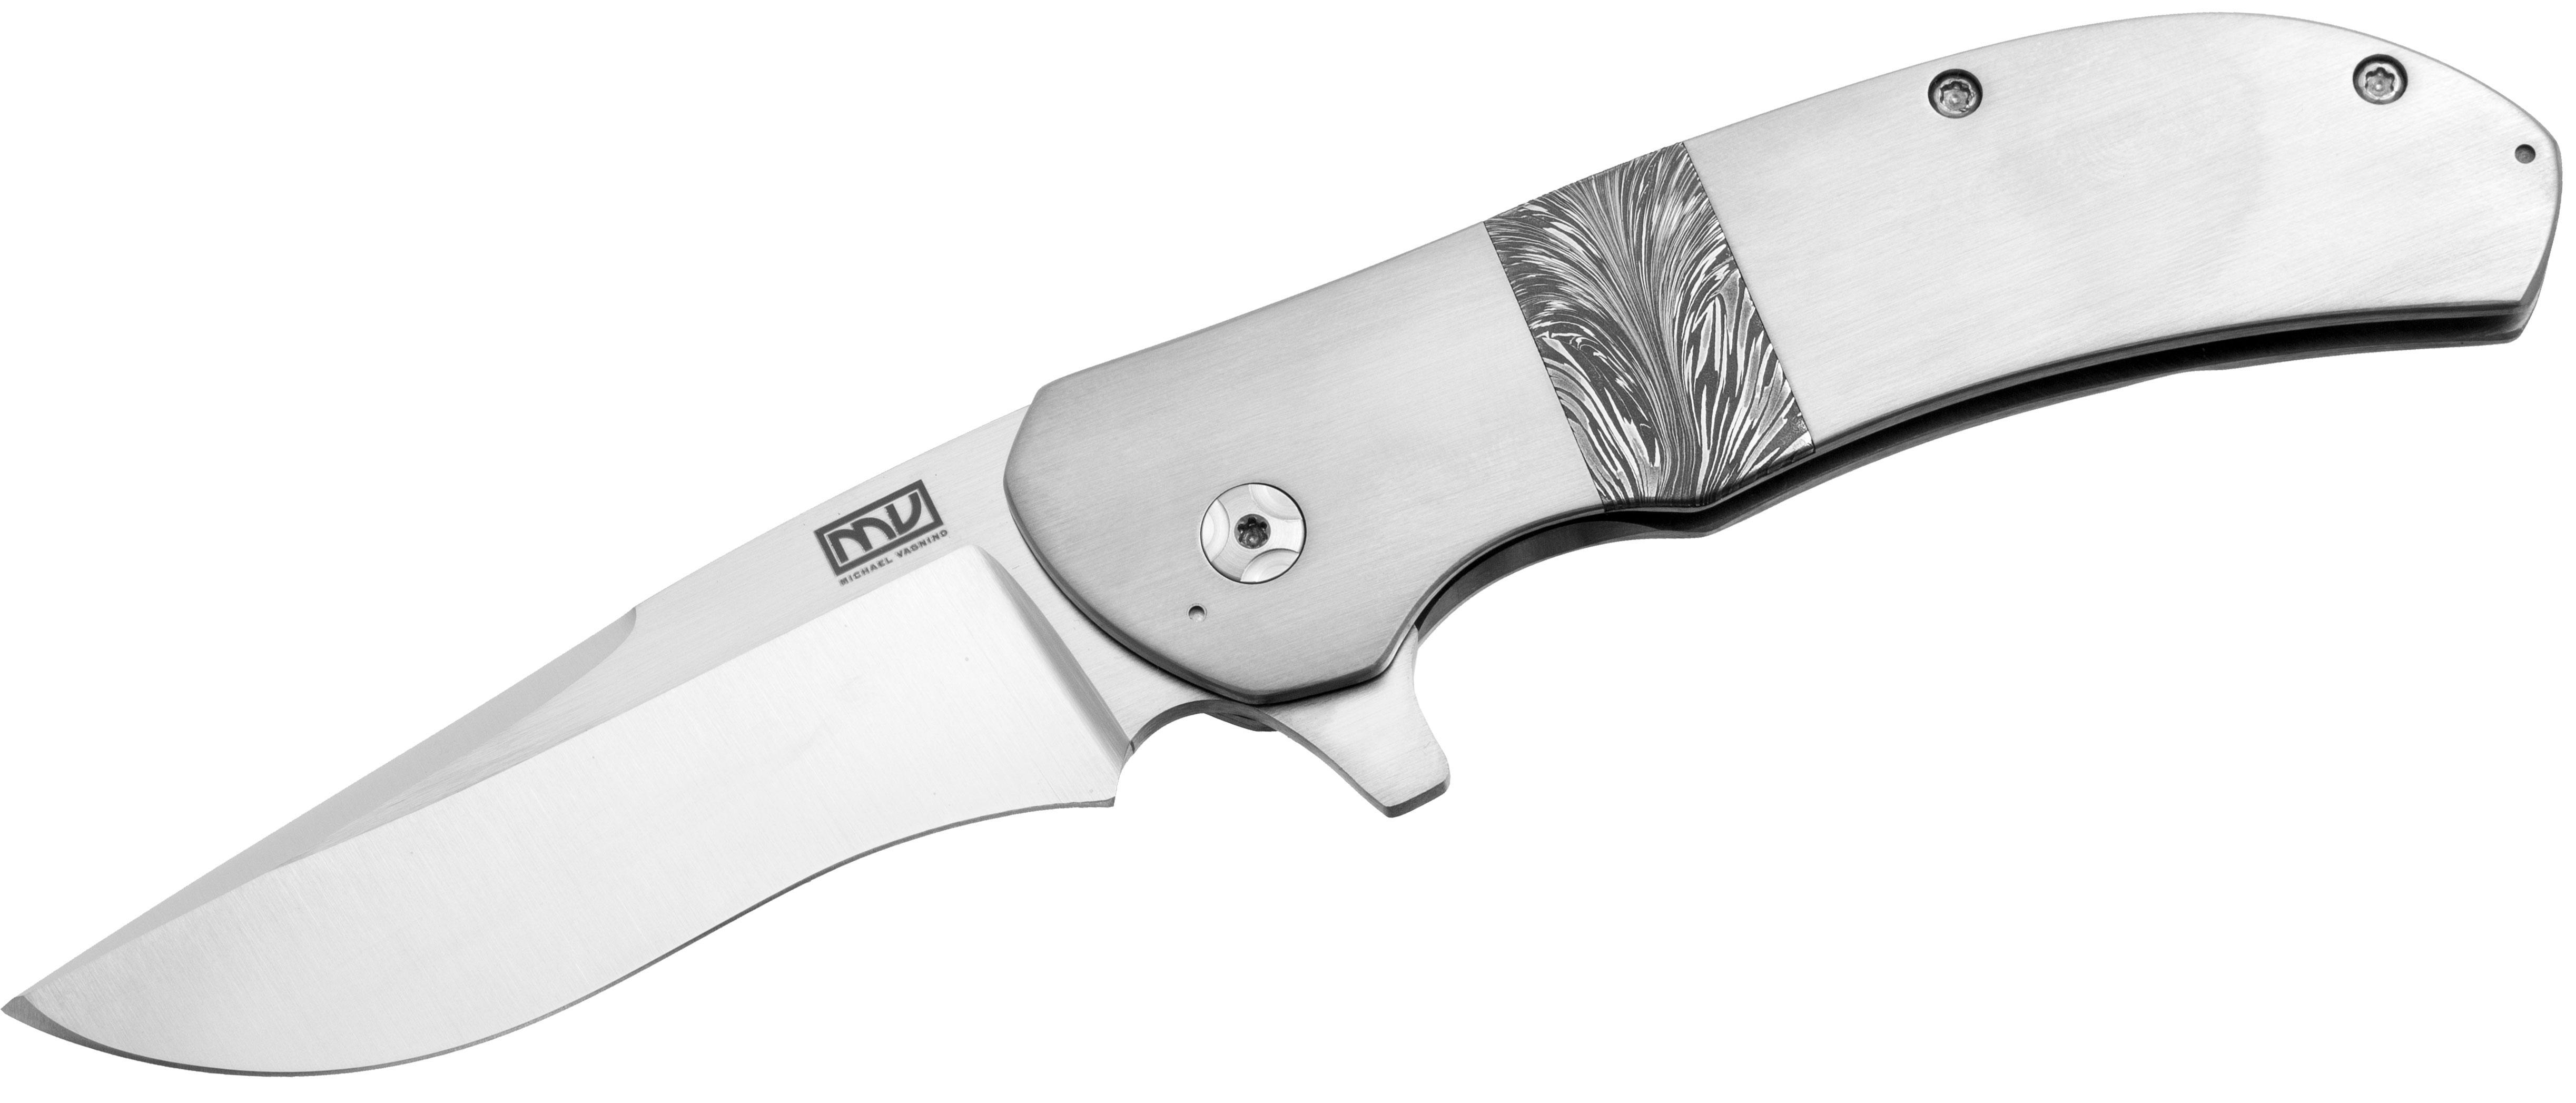 Mike Vagnino Custom Eliminator Flipper 3.375 inch CTS-XHP Drop Point Blade, Titanium Handles with Eruption Damascus Inlay